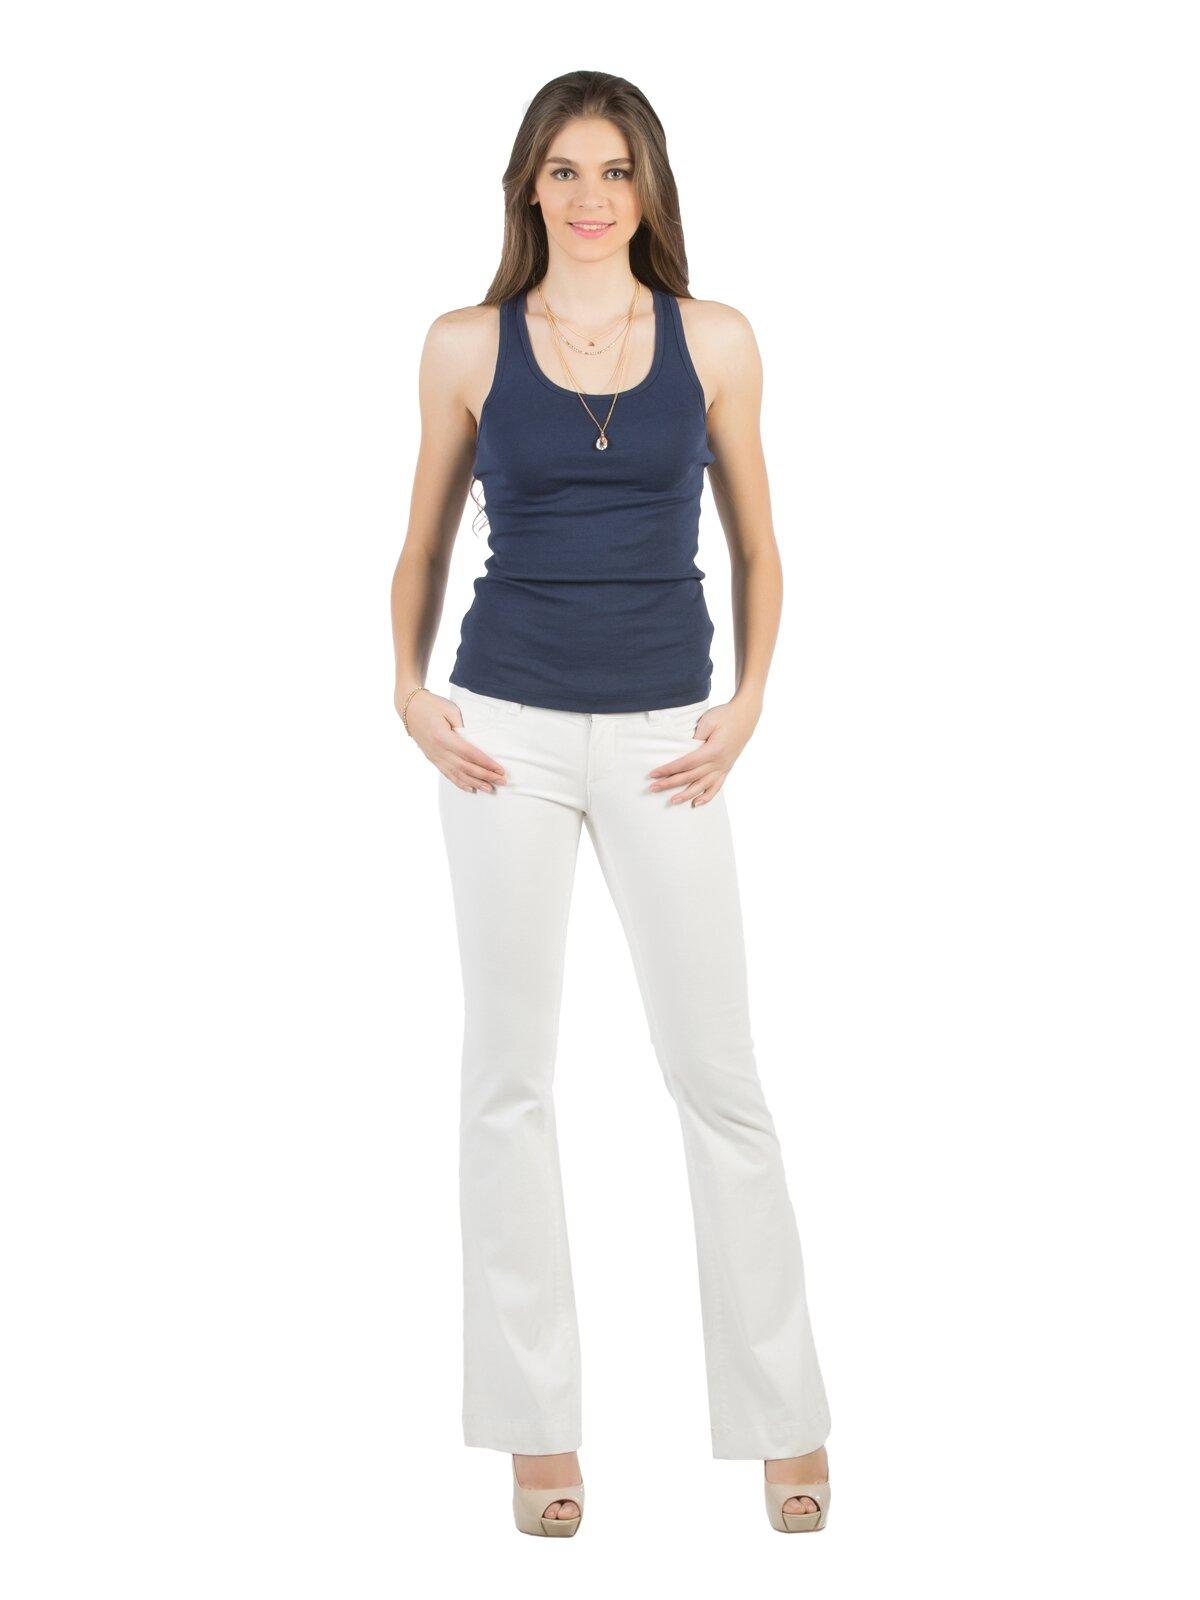 Slim Fit Super Flare Paça Düşük Bel Beyaz Kadın Pantolon